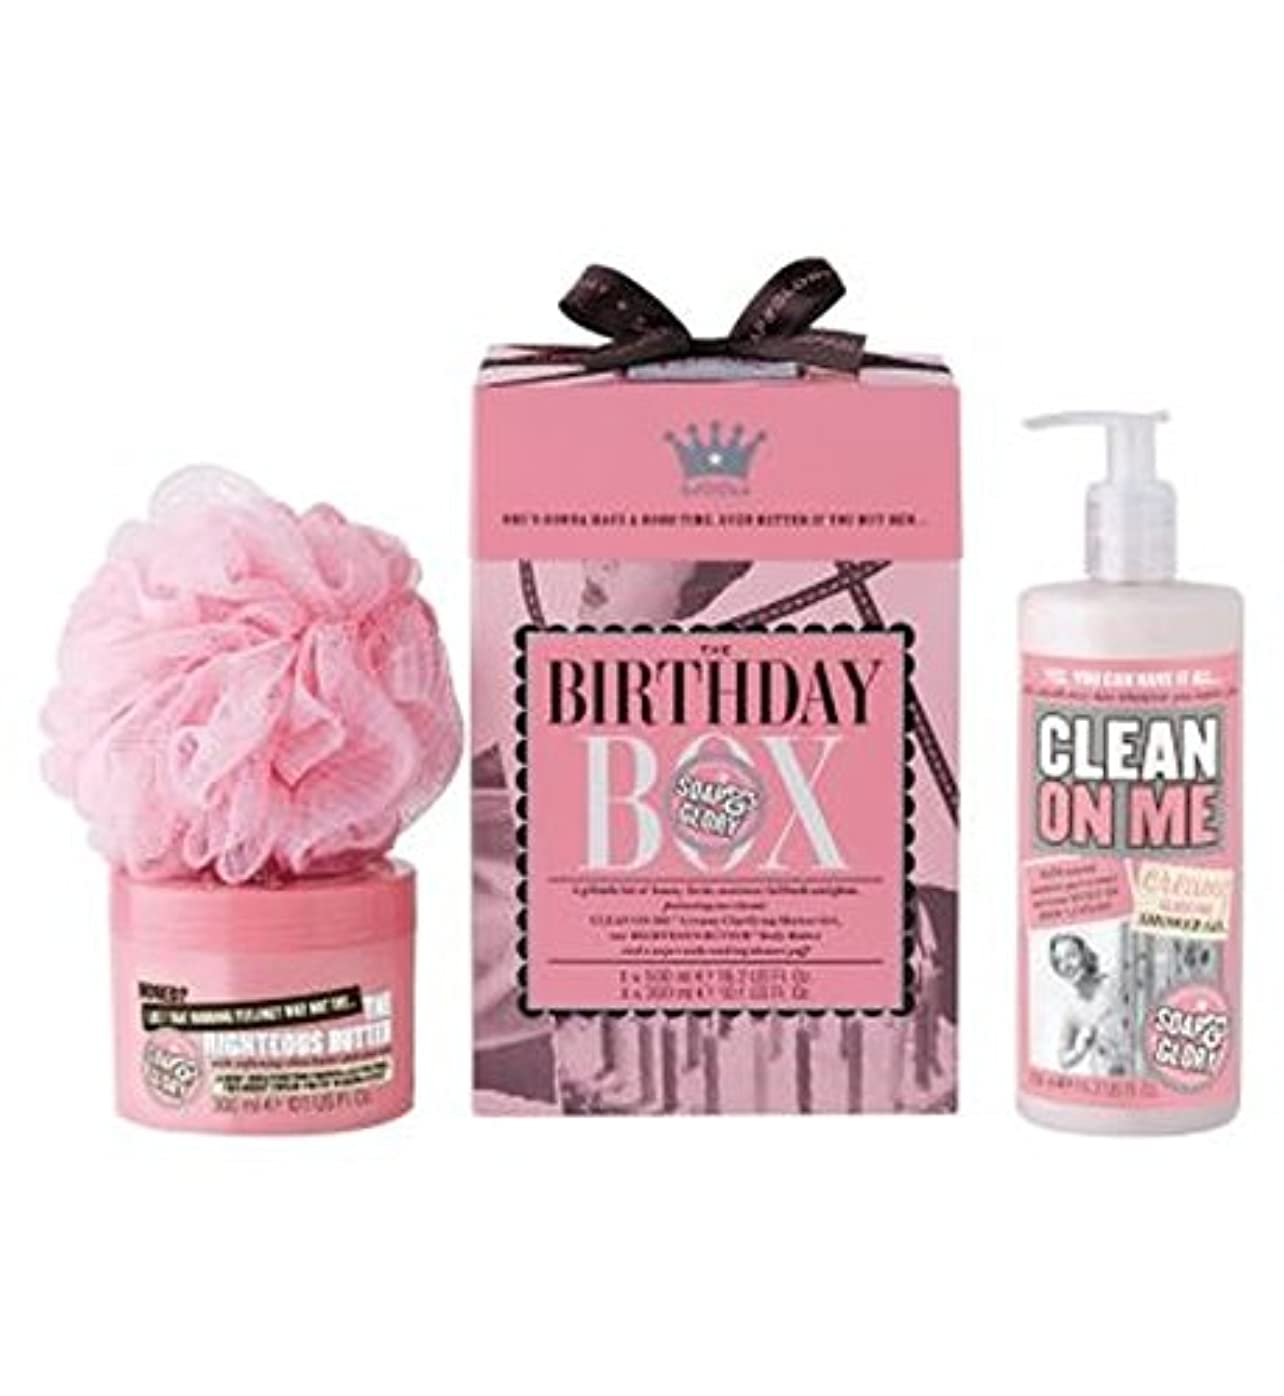 Soap & Glory The Birthday Box Gift Set - 石鹸&栄光の誕生日箱のギフトセット (Soap & Glory) [並行輸入品]